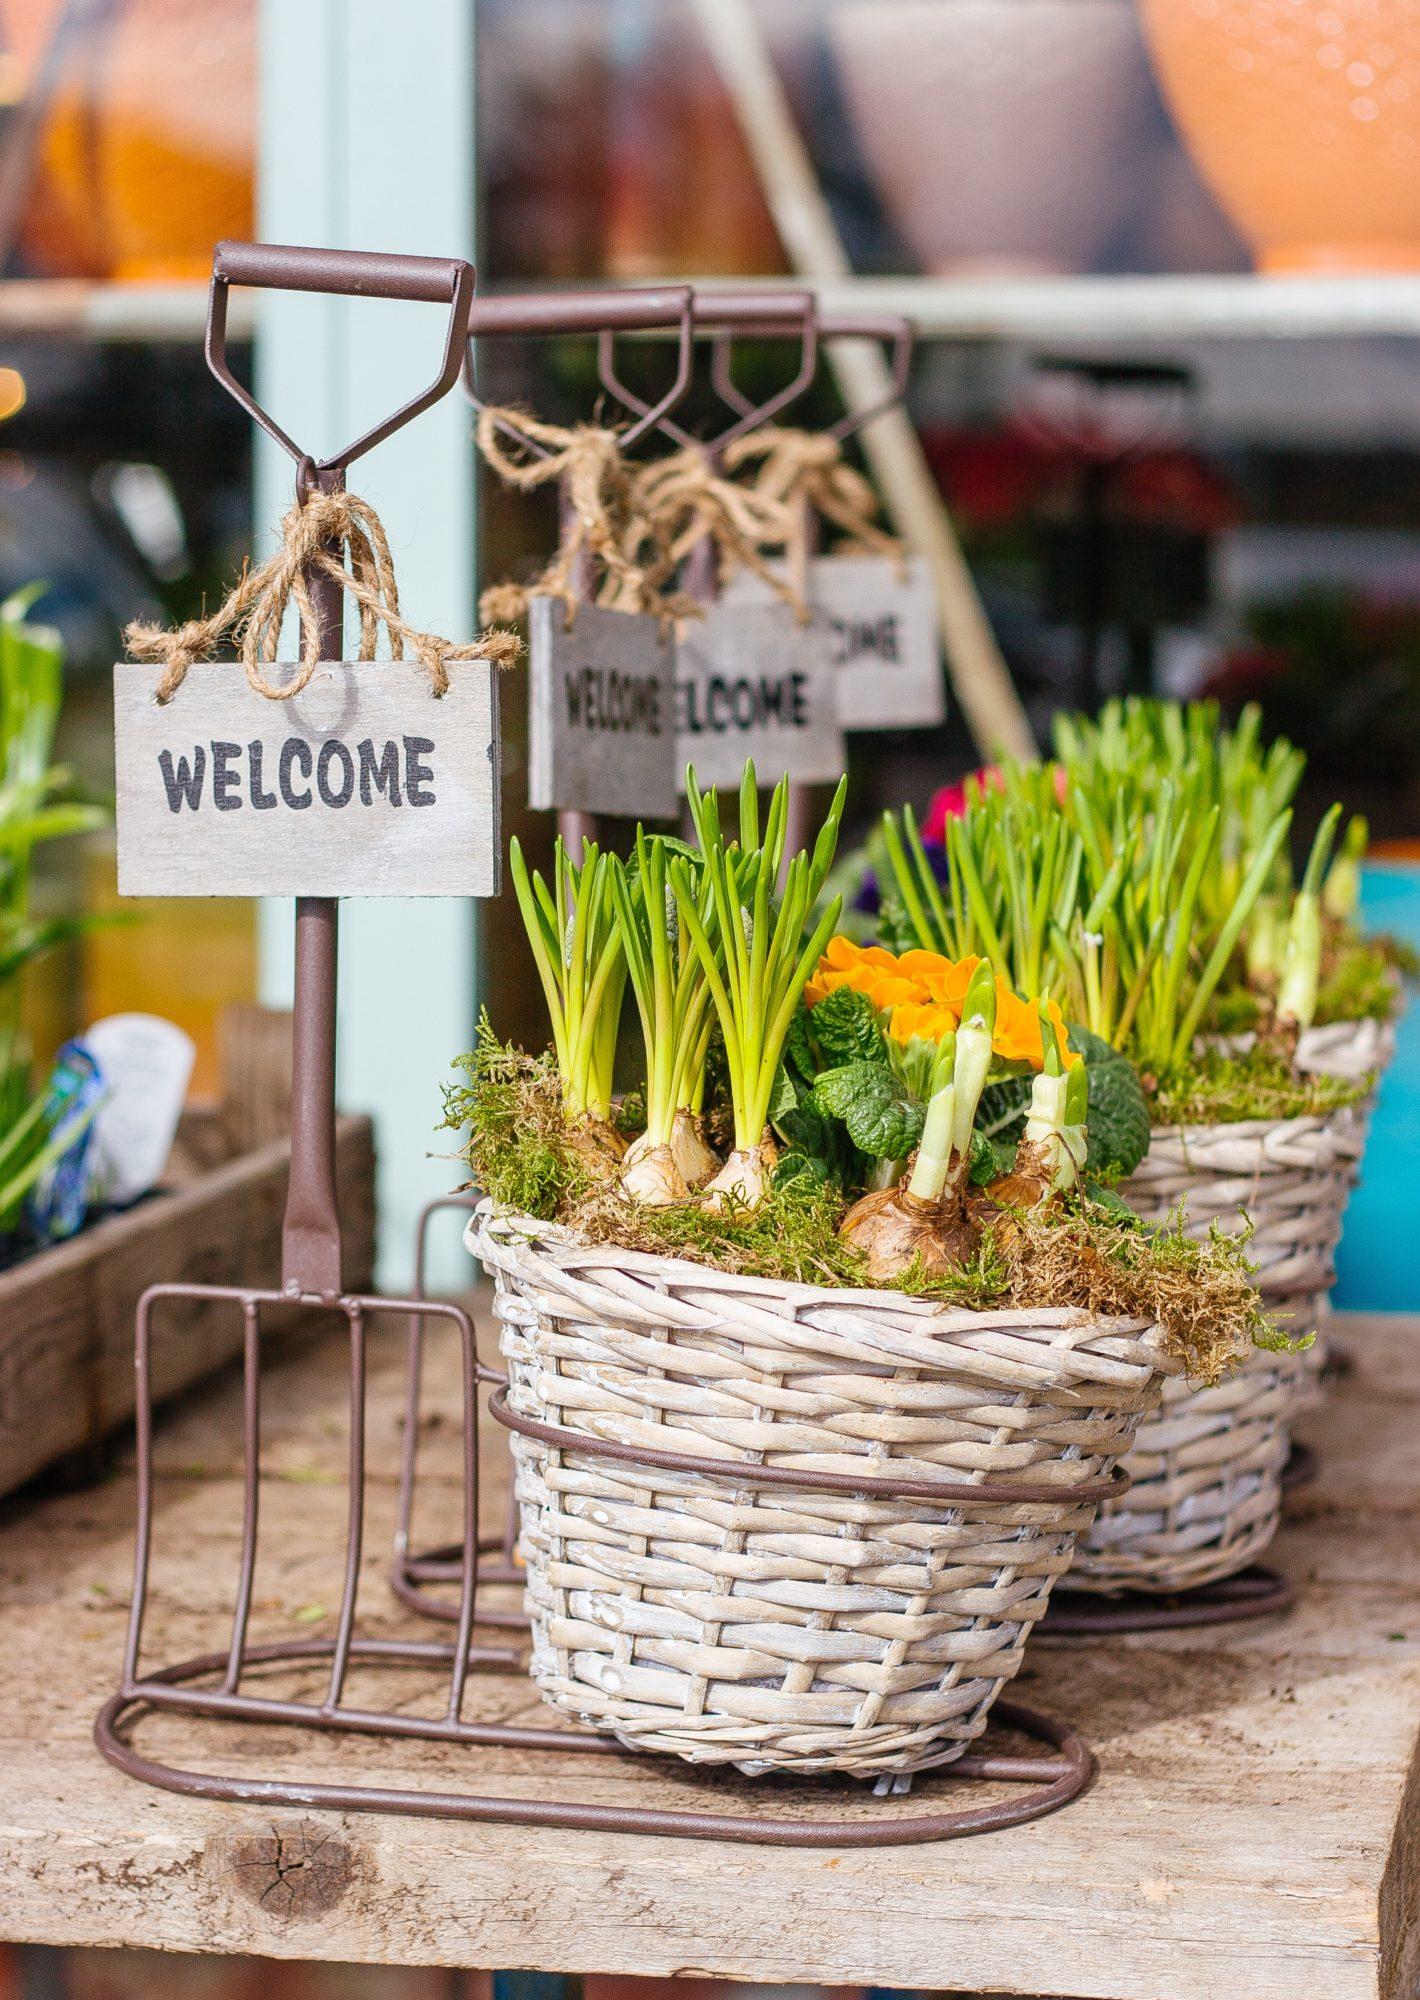 Garden Checklist: Top Tips on How to Get Your Garden Ready for Spring